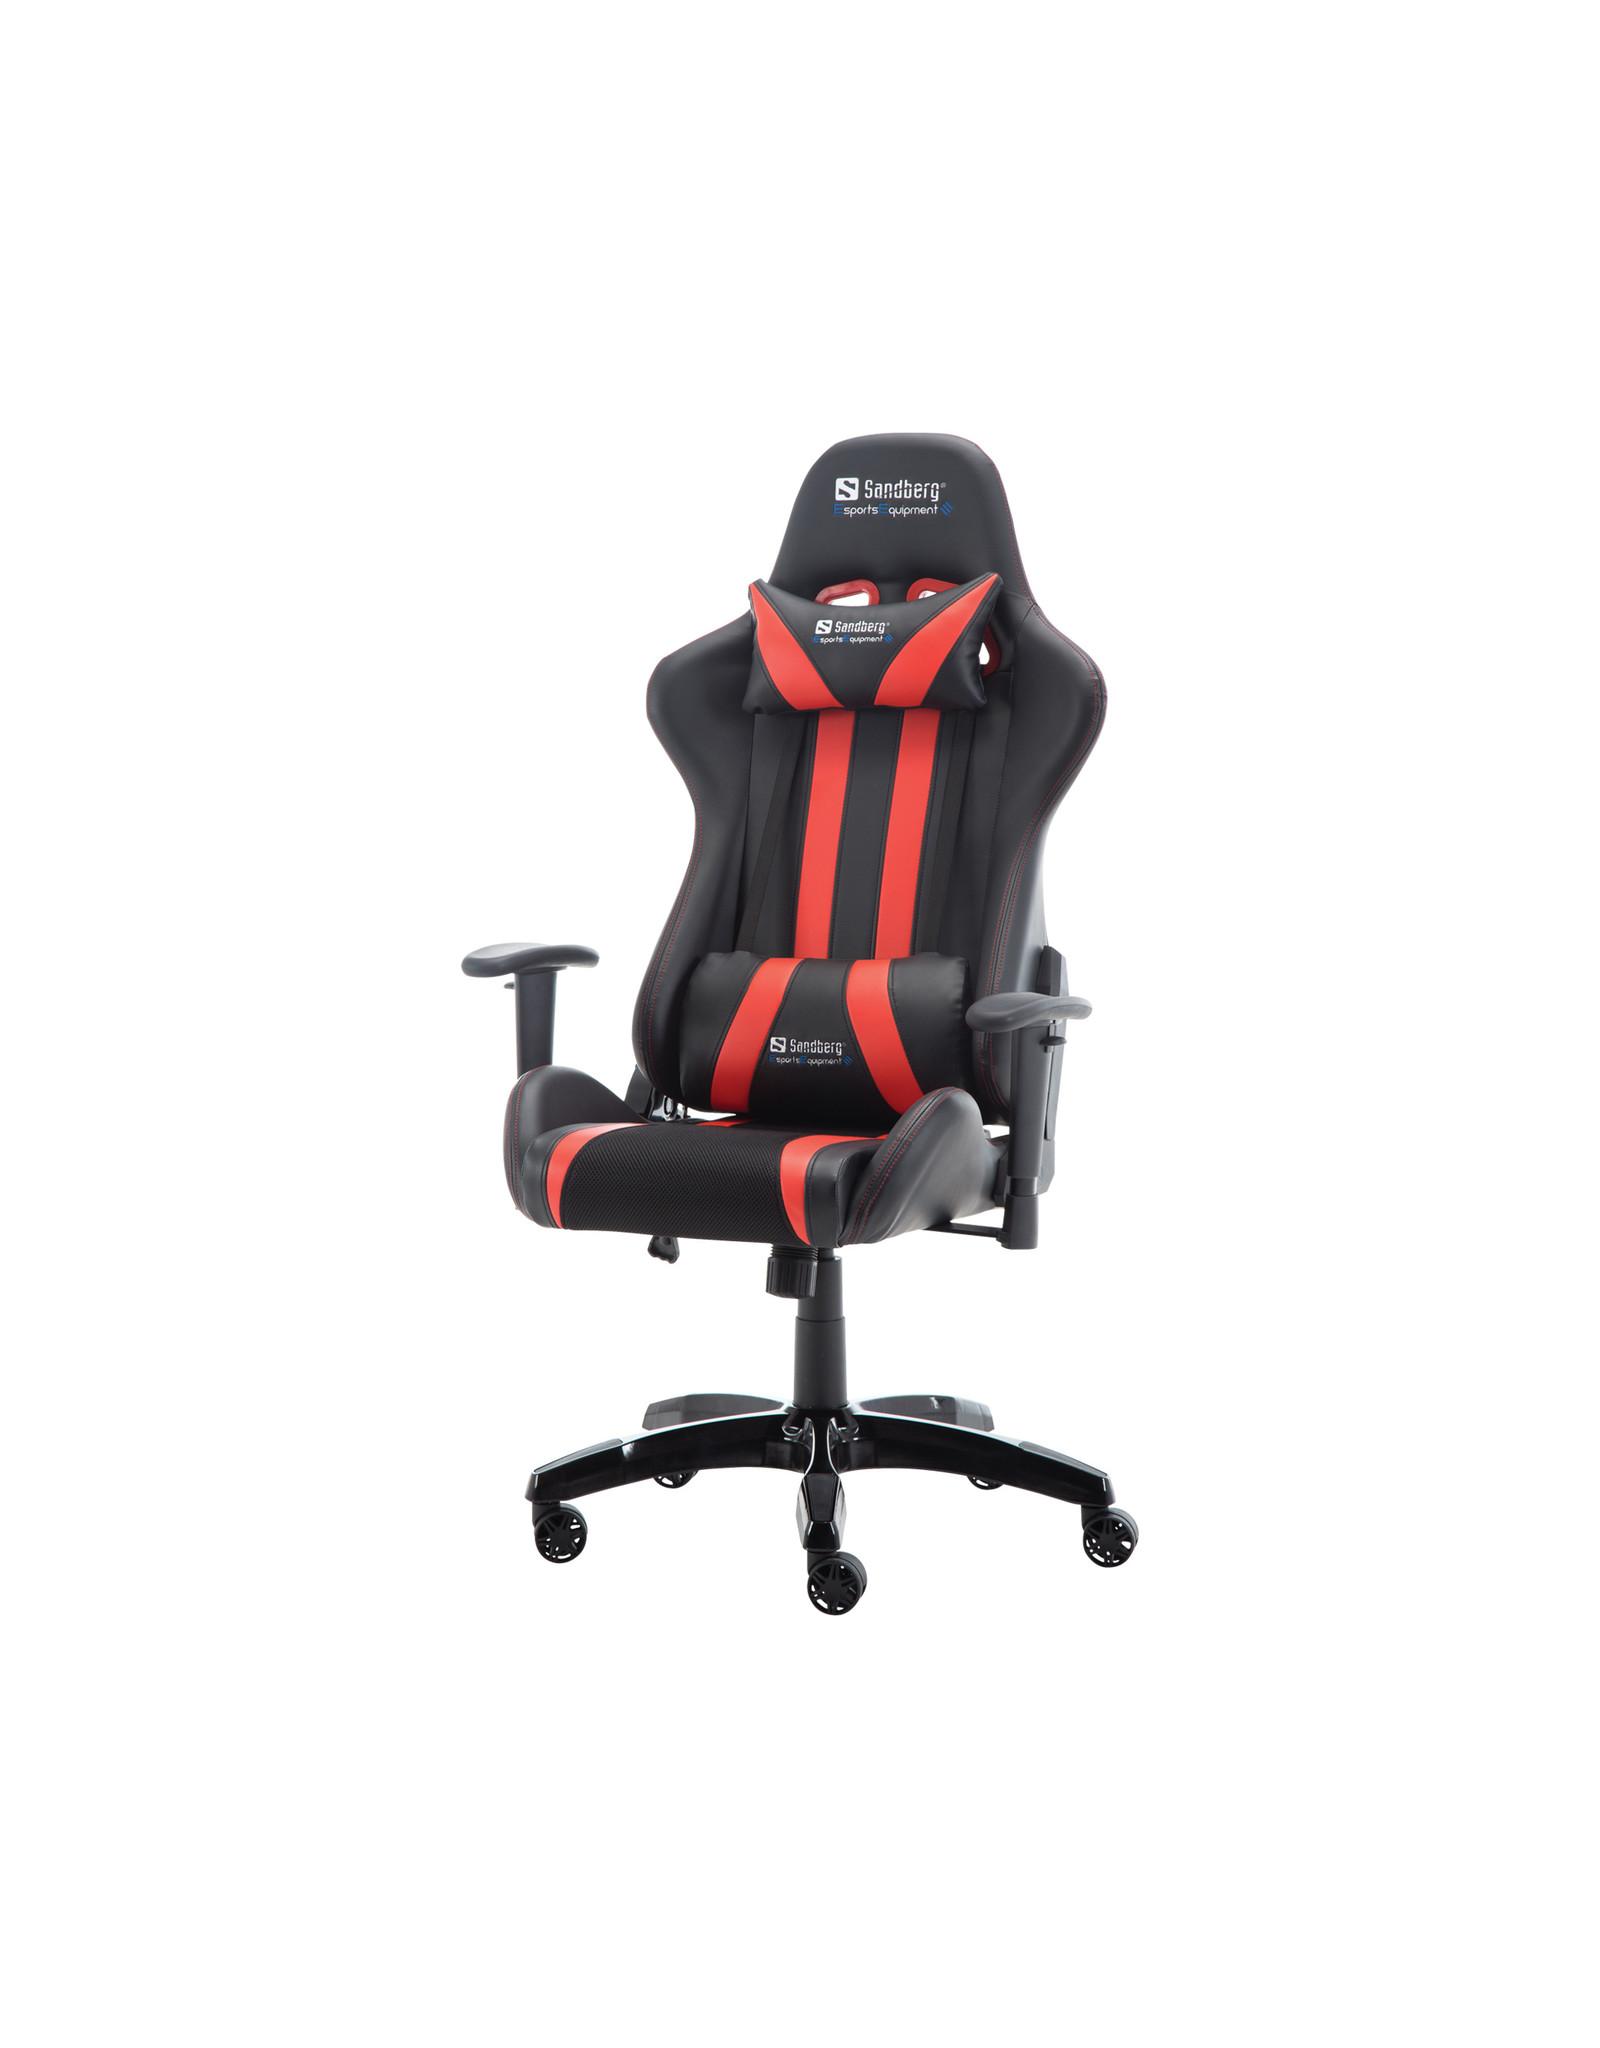 Sandberg  Sandberg Commander Gaming Chair